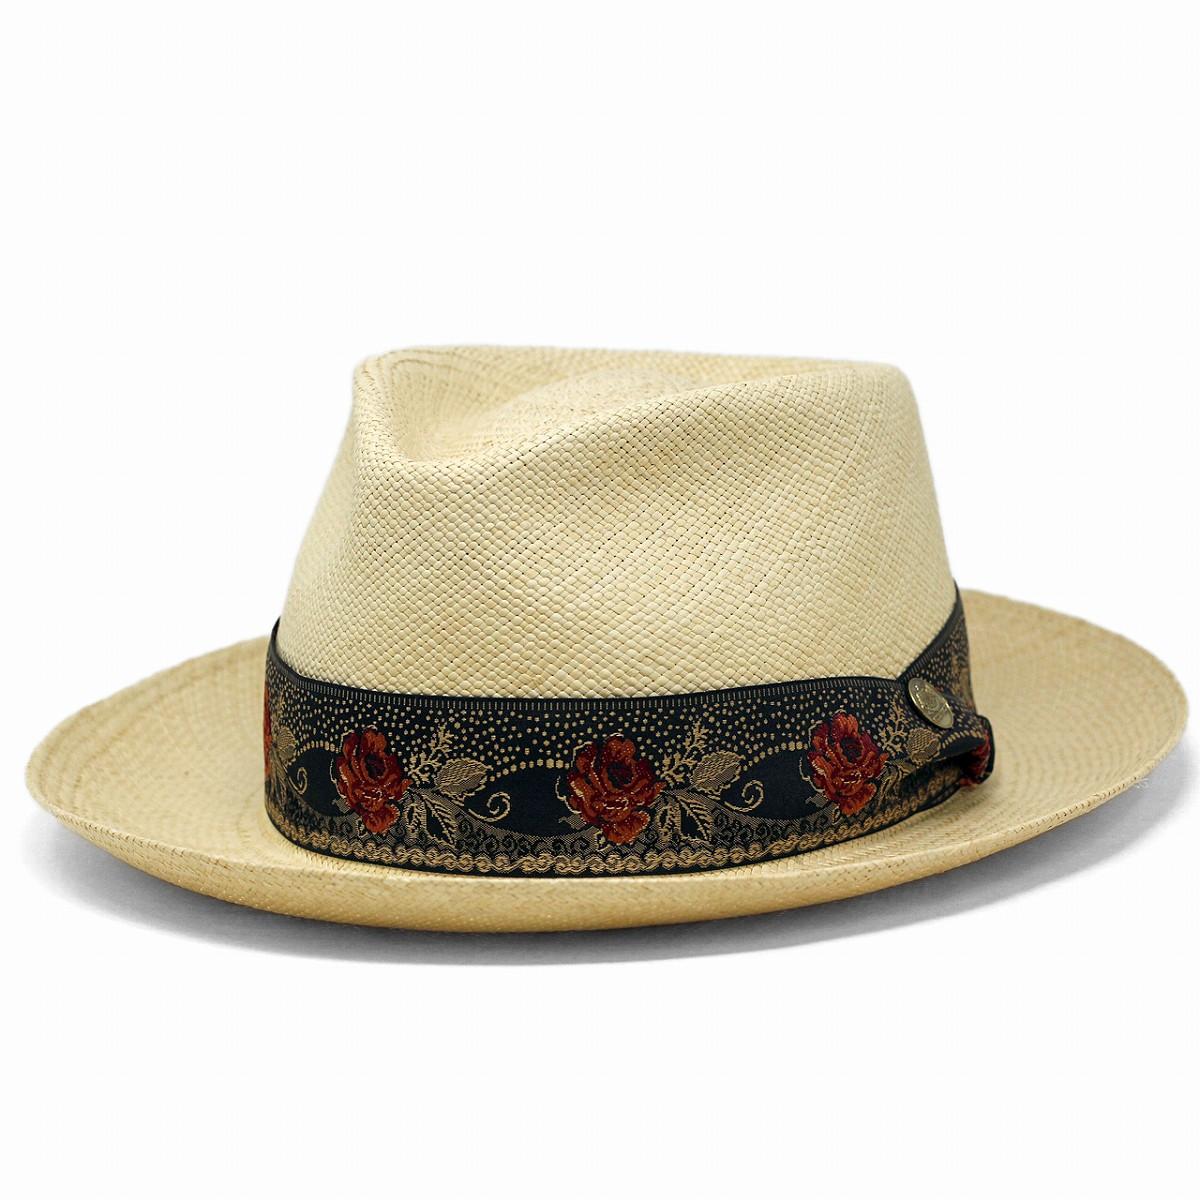 d46006270 Panama hat STETSON rose embroidery ribbon overseas brand Stetson straw hat  men hat soft felt hat hat straw hat 58cm 60cm stetson hat / natural [panama  ...